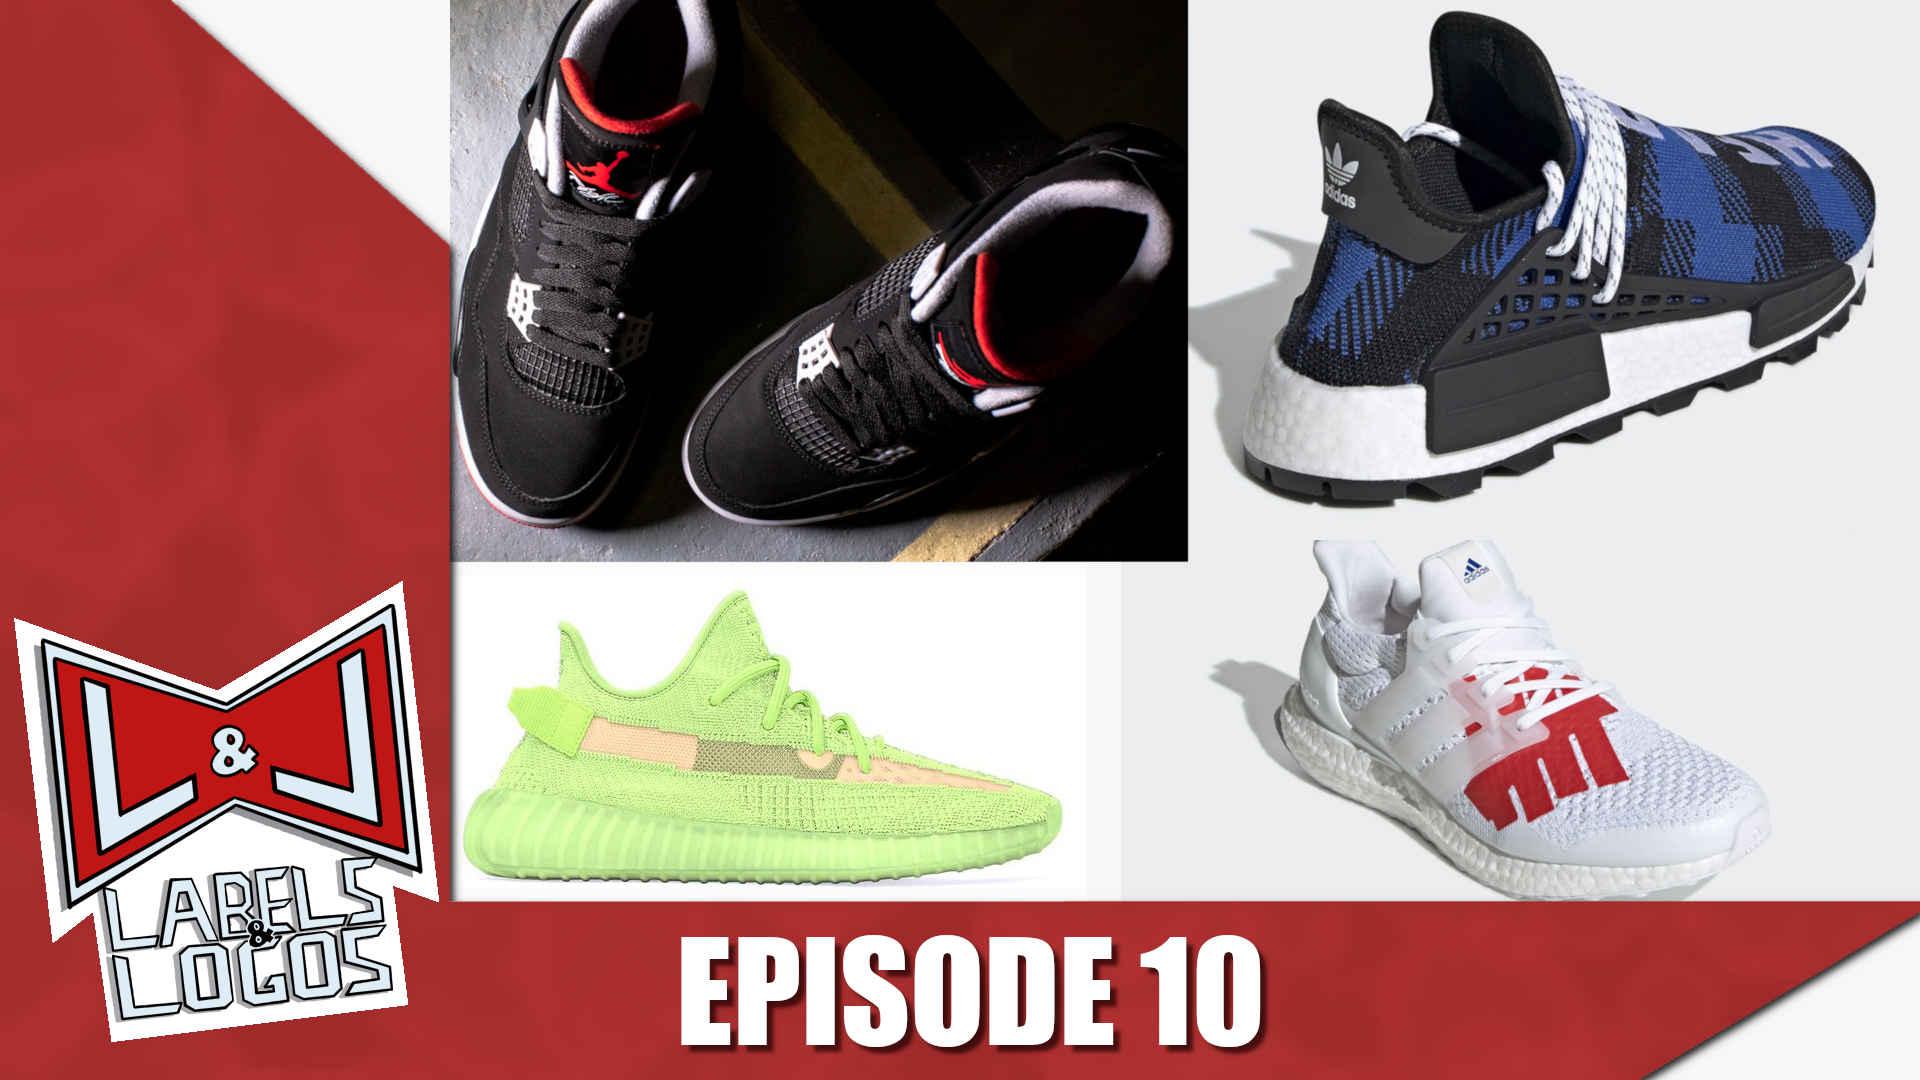 Labels & Logos - Episode 10